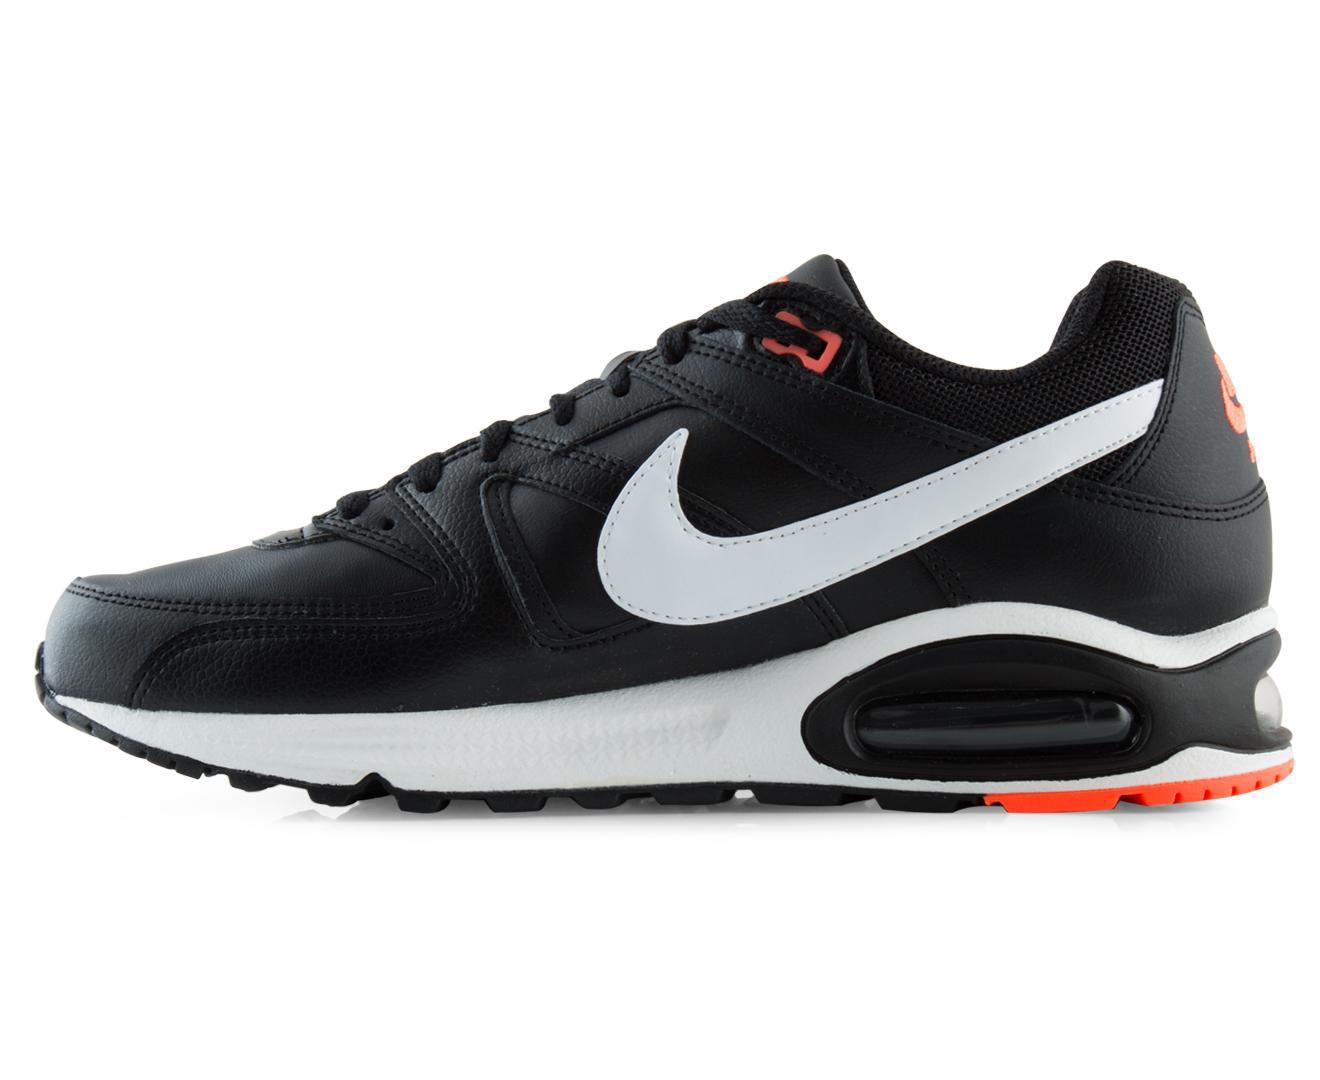 official photos 09058 878de Nike Men s Air Max Command Leather Shoe - Black White Bright Mango    Catch.com.au